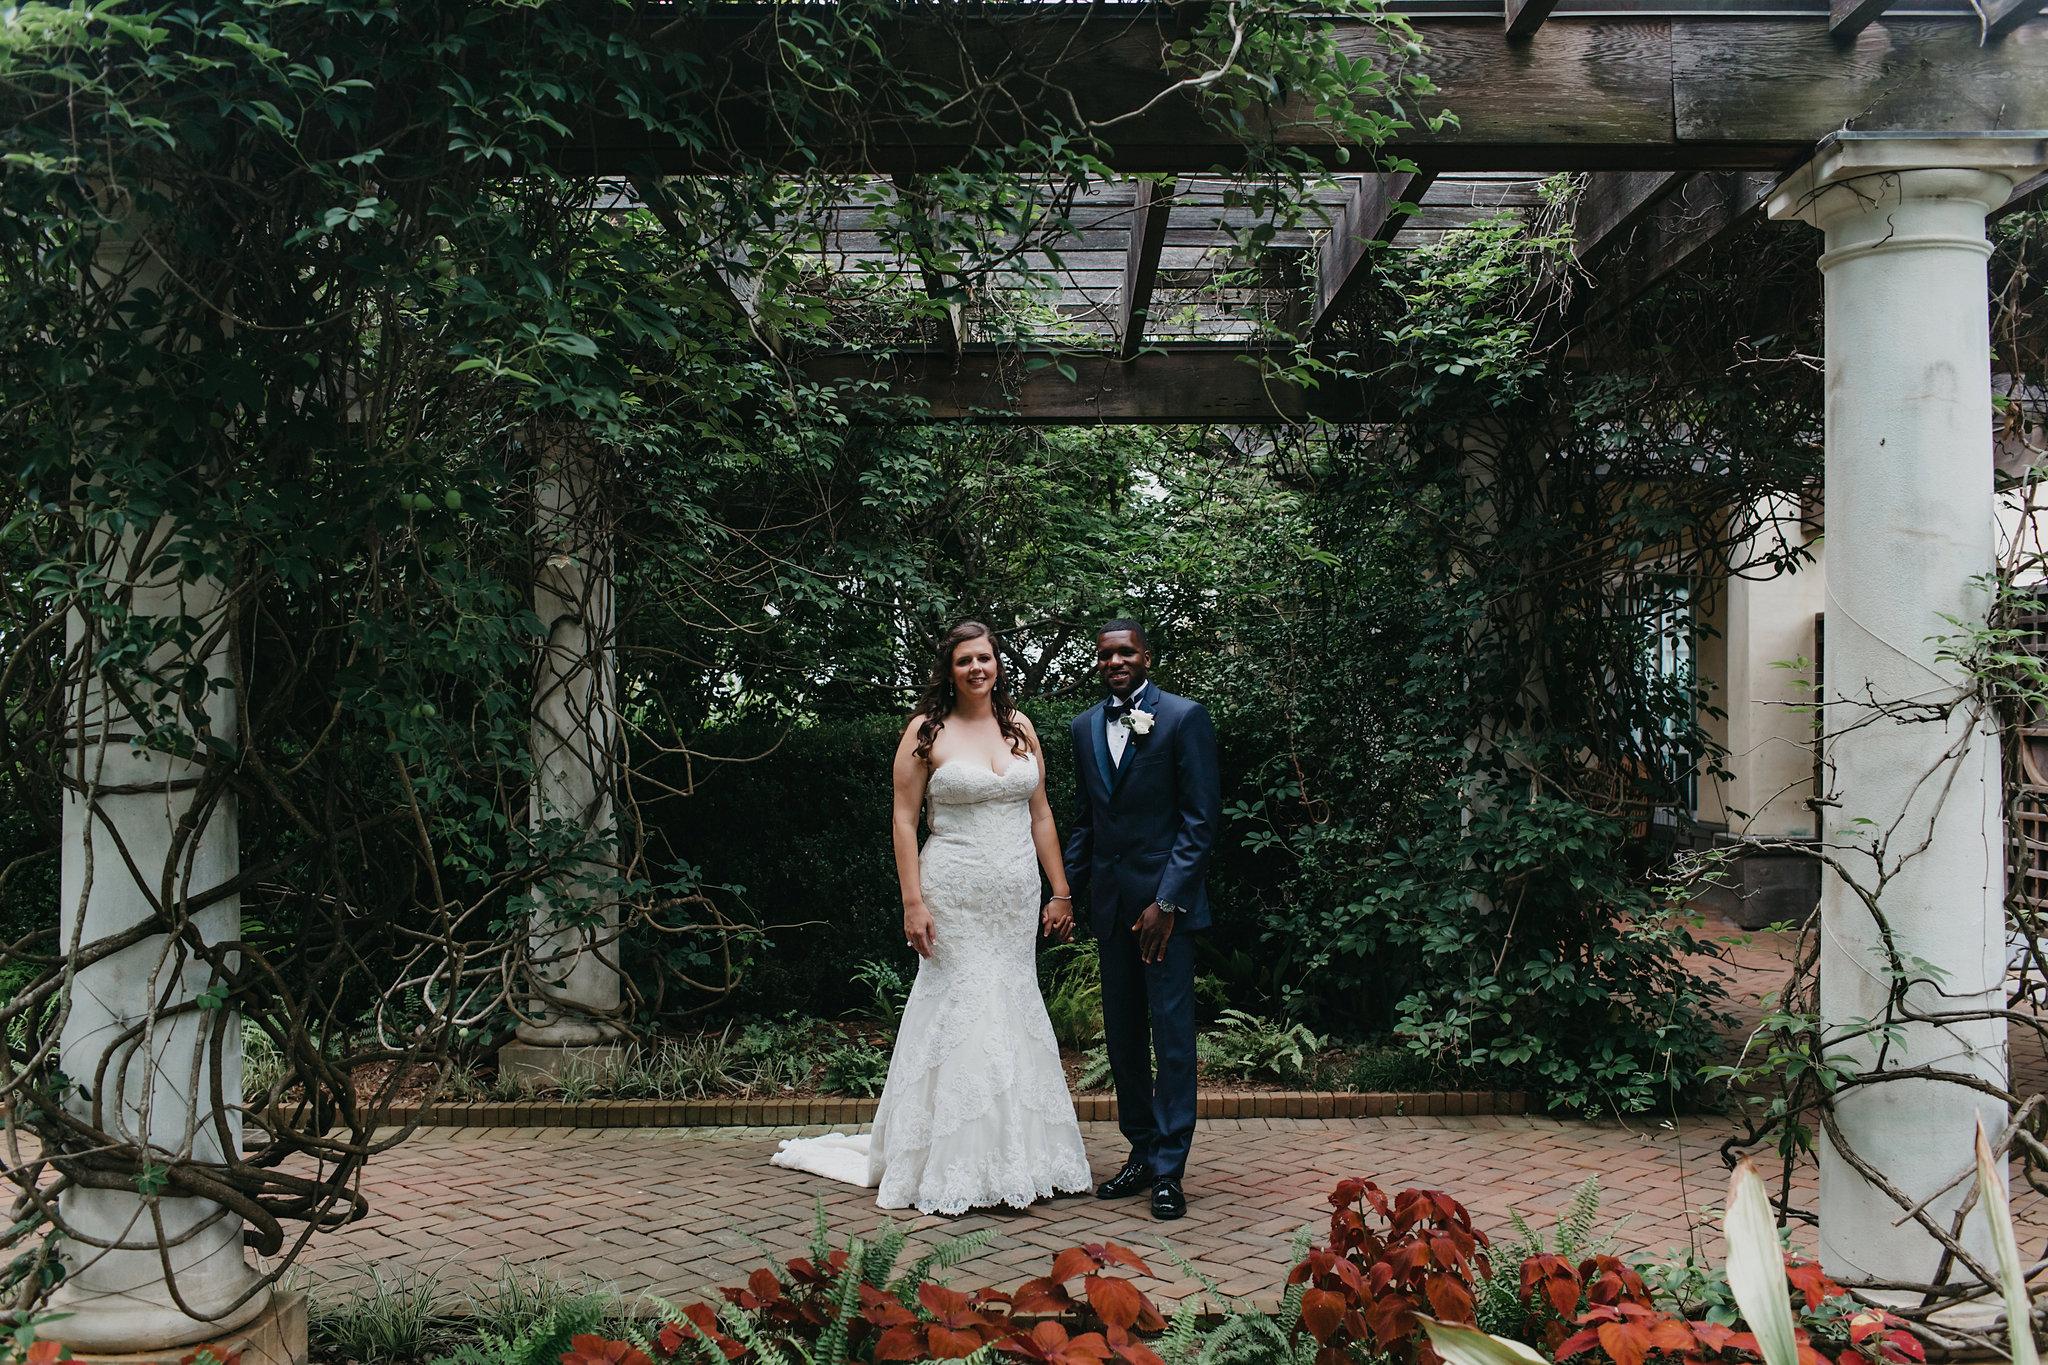 Daniel Stowe Botanical Gardens, Belmont, NC Photography: Kasey Loftin